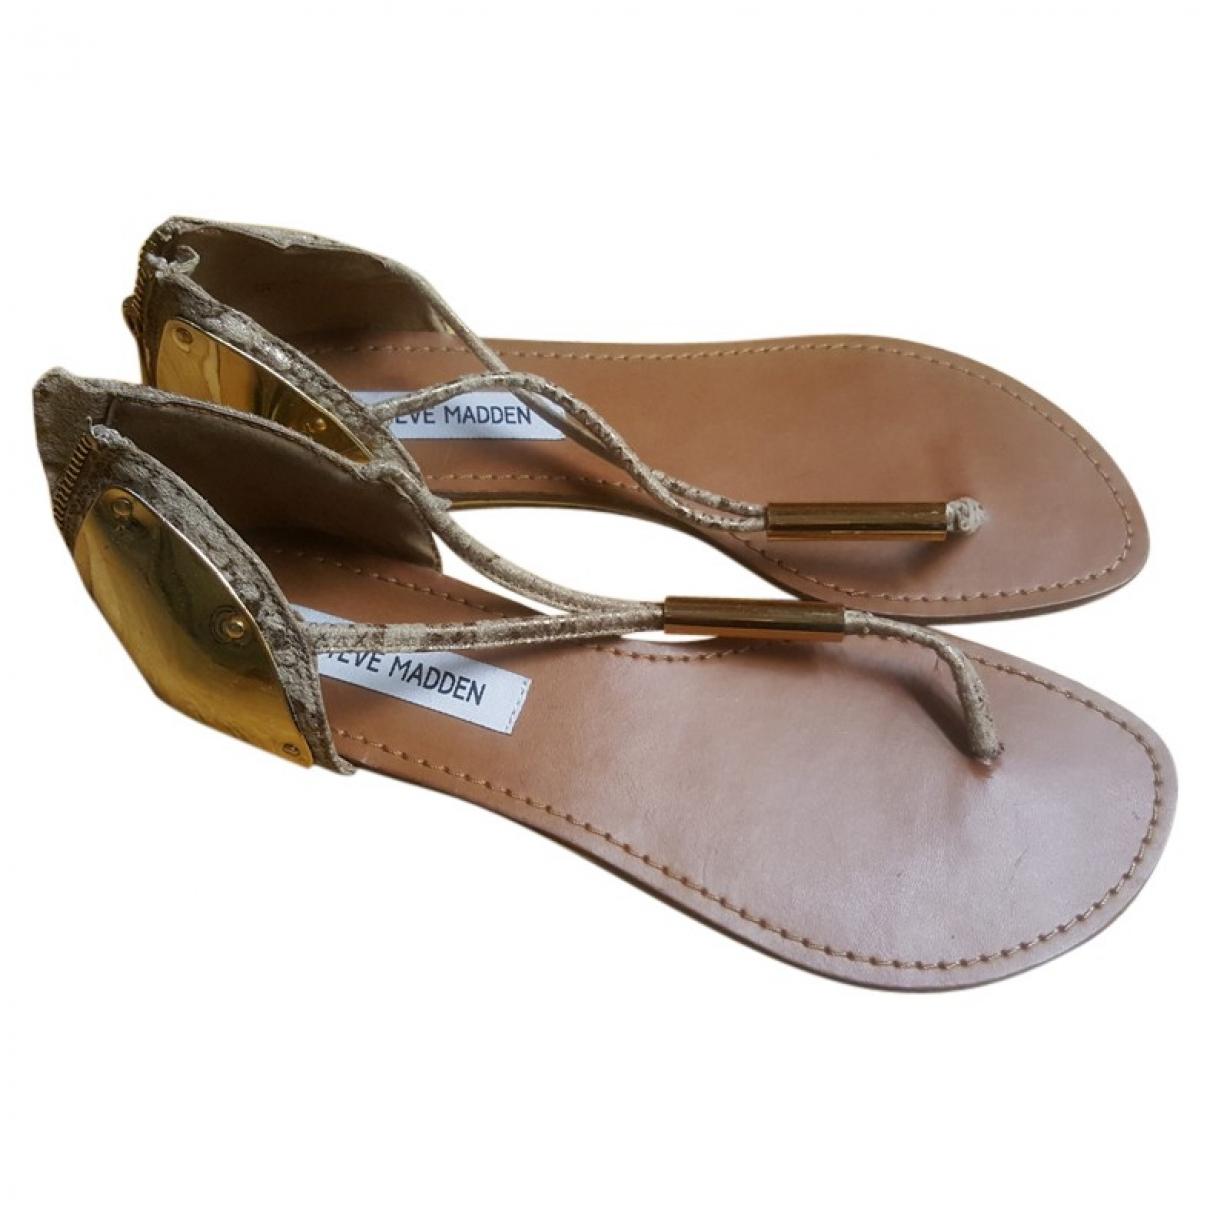 Steve Madden \N Gold Leather Sandals for Women 40 EU